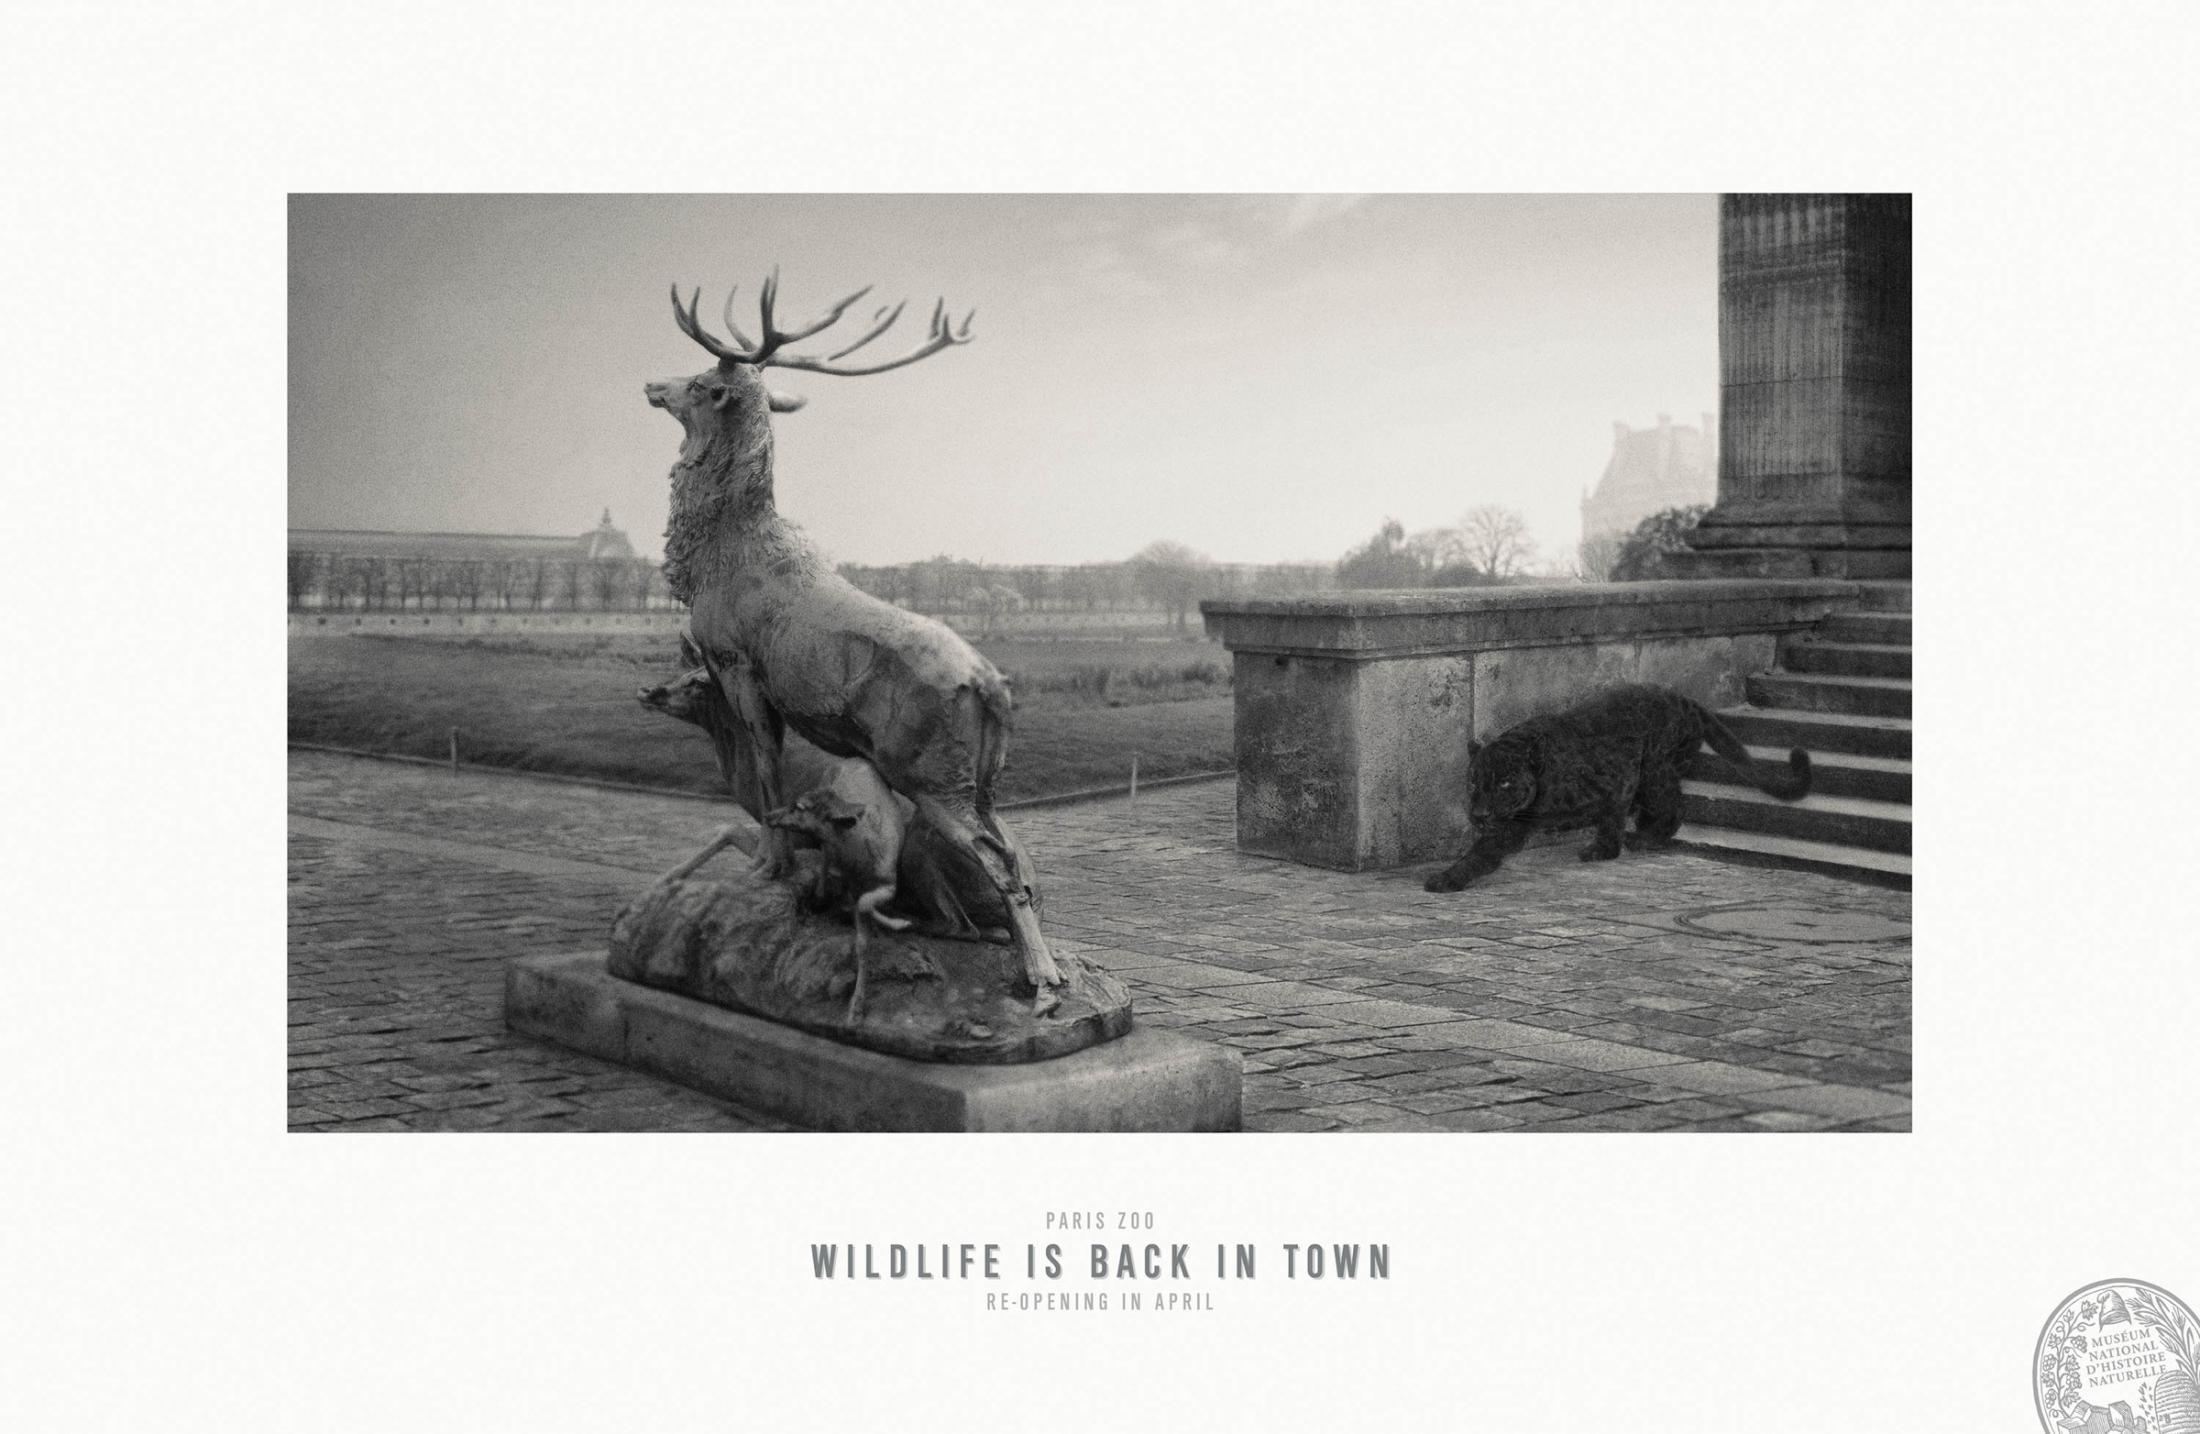 Paris Zoo Print Ad -  Wildlife is back in town, 4